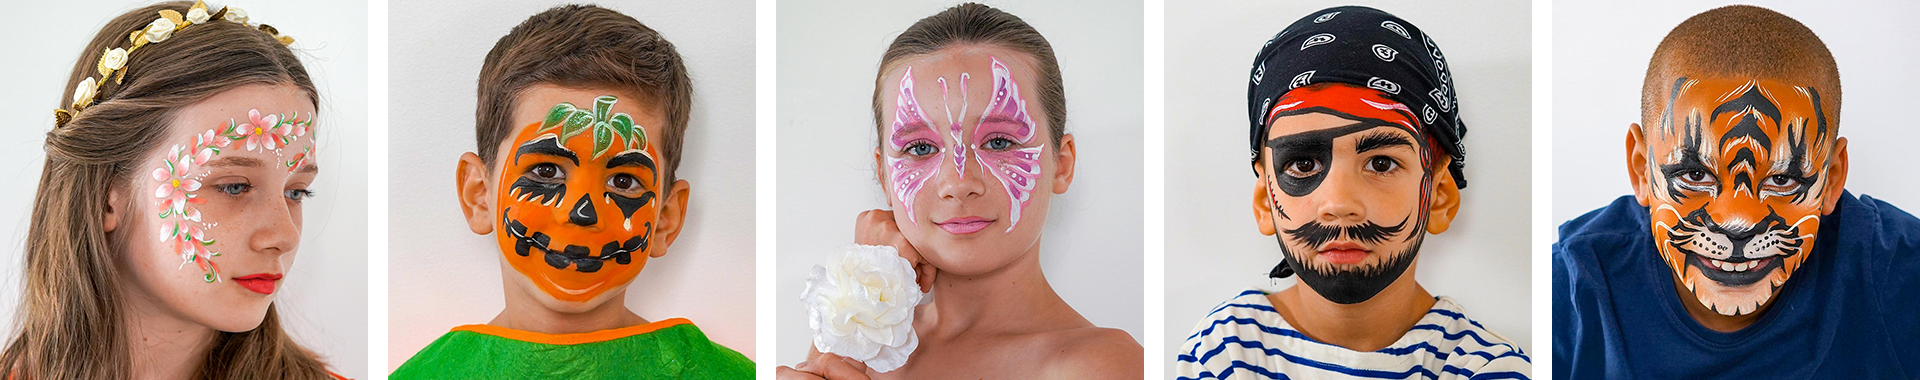 formation-maquillage-enfant-niveau1